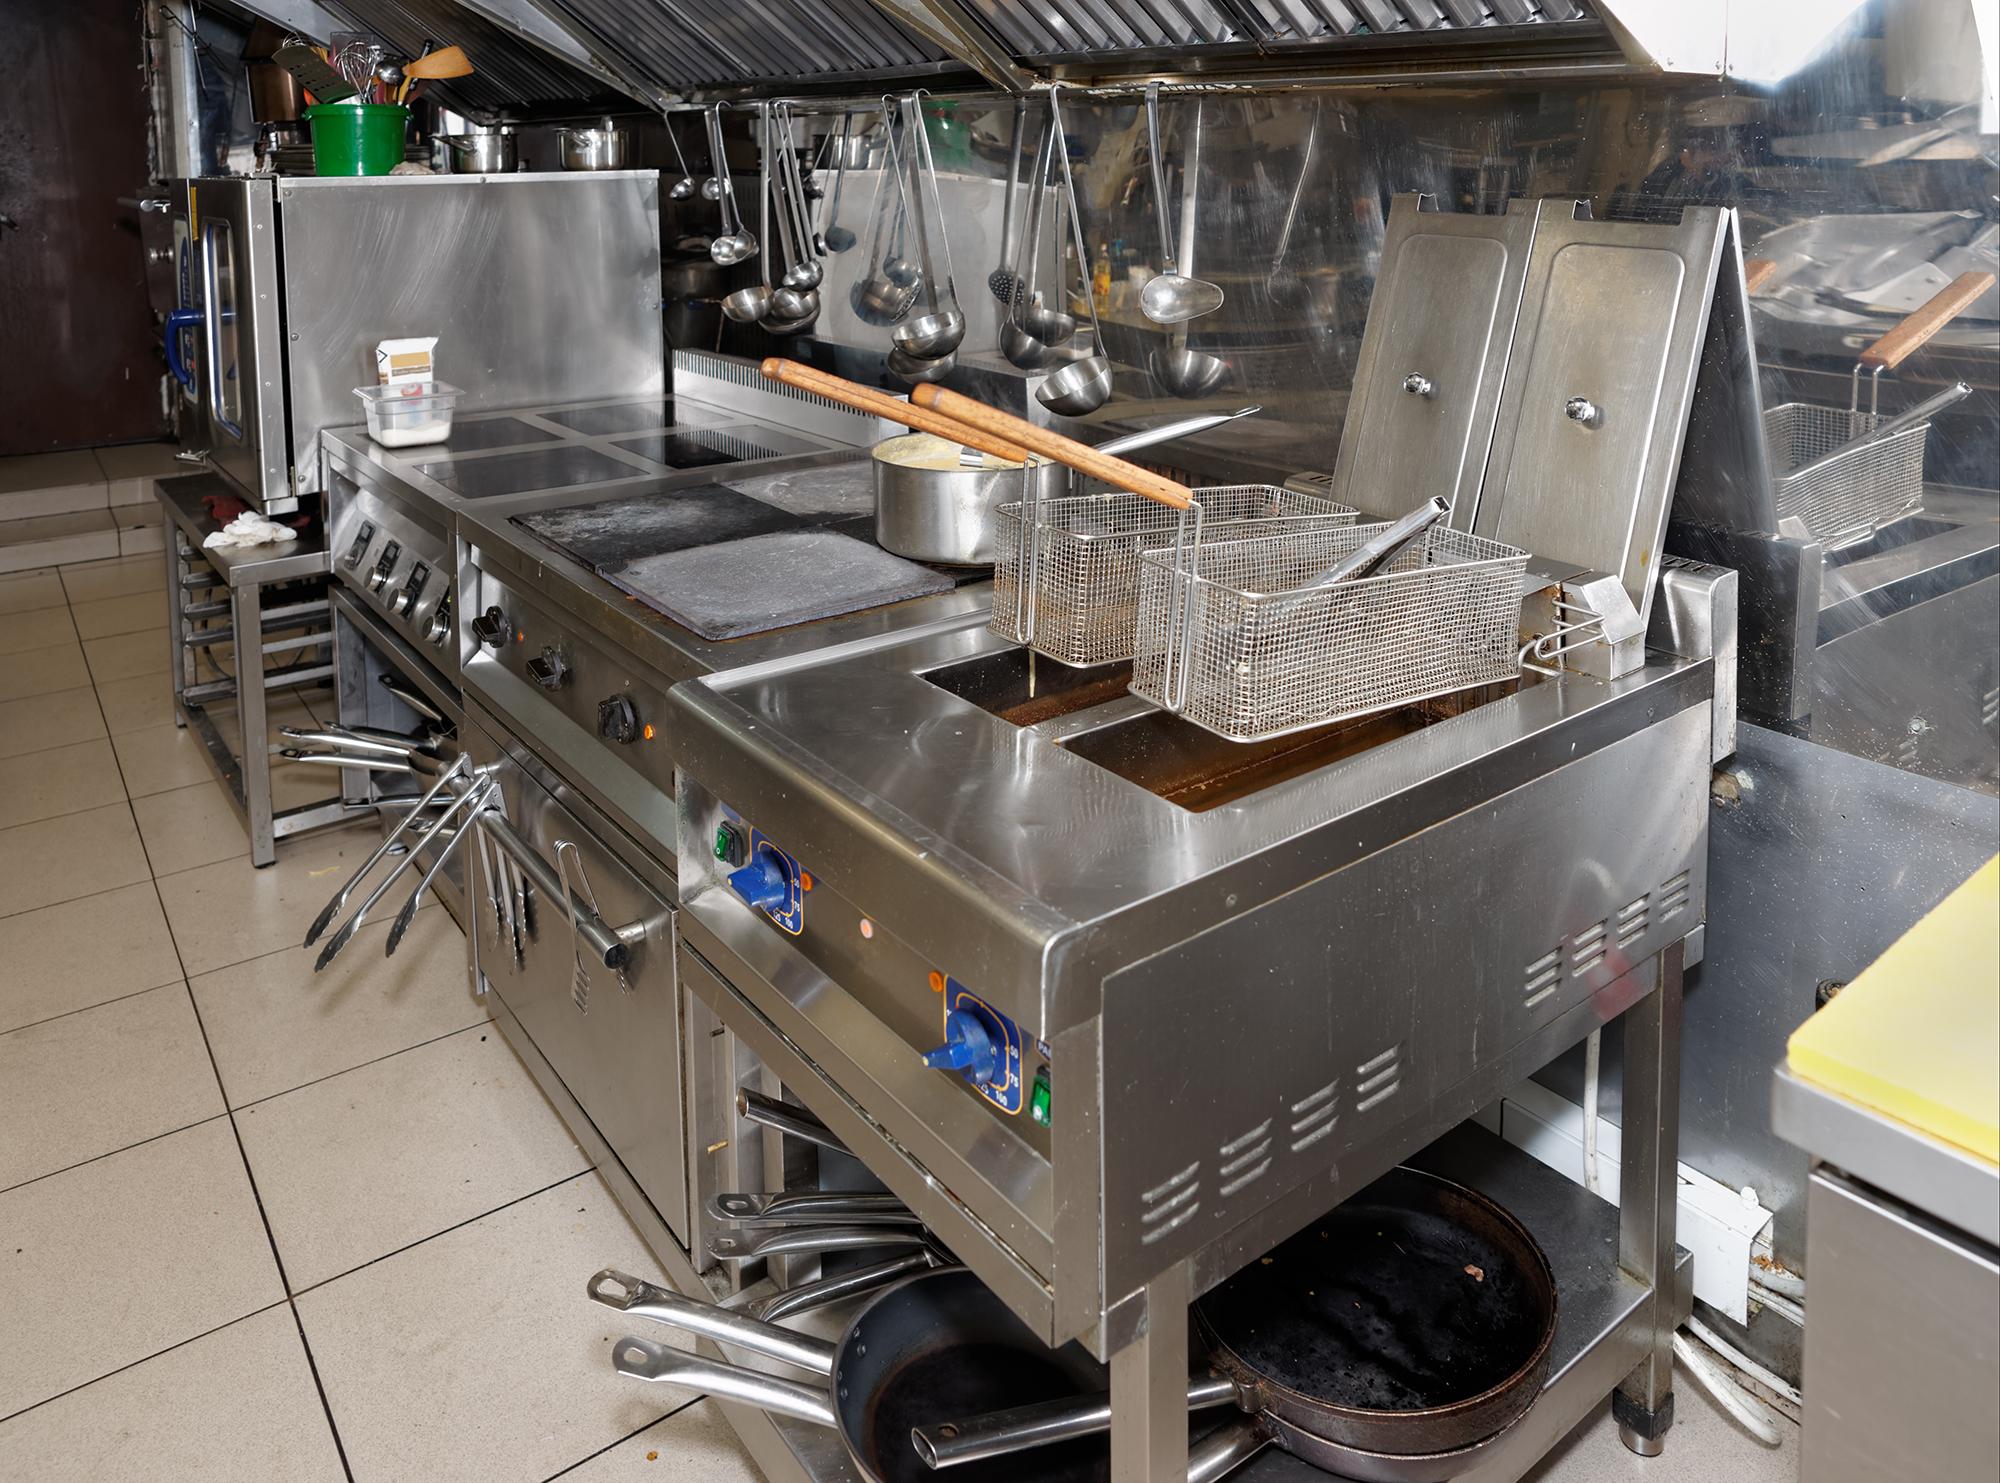 厨房機器の処分/買取